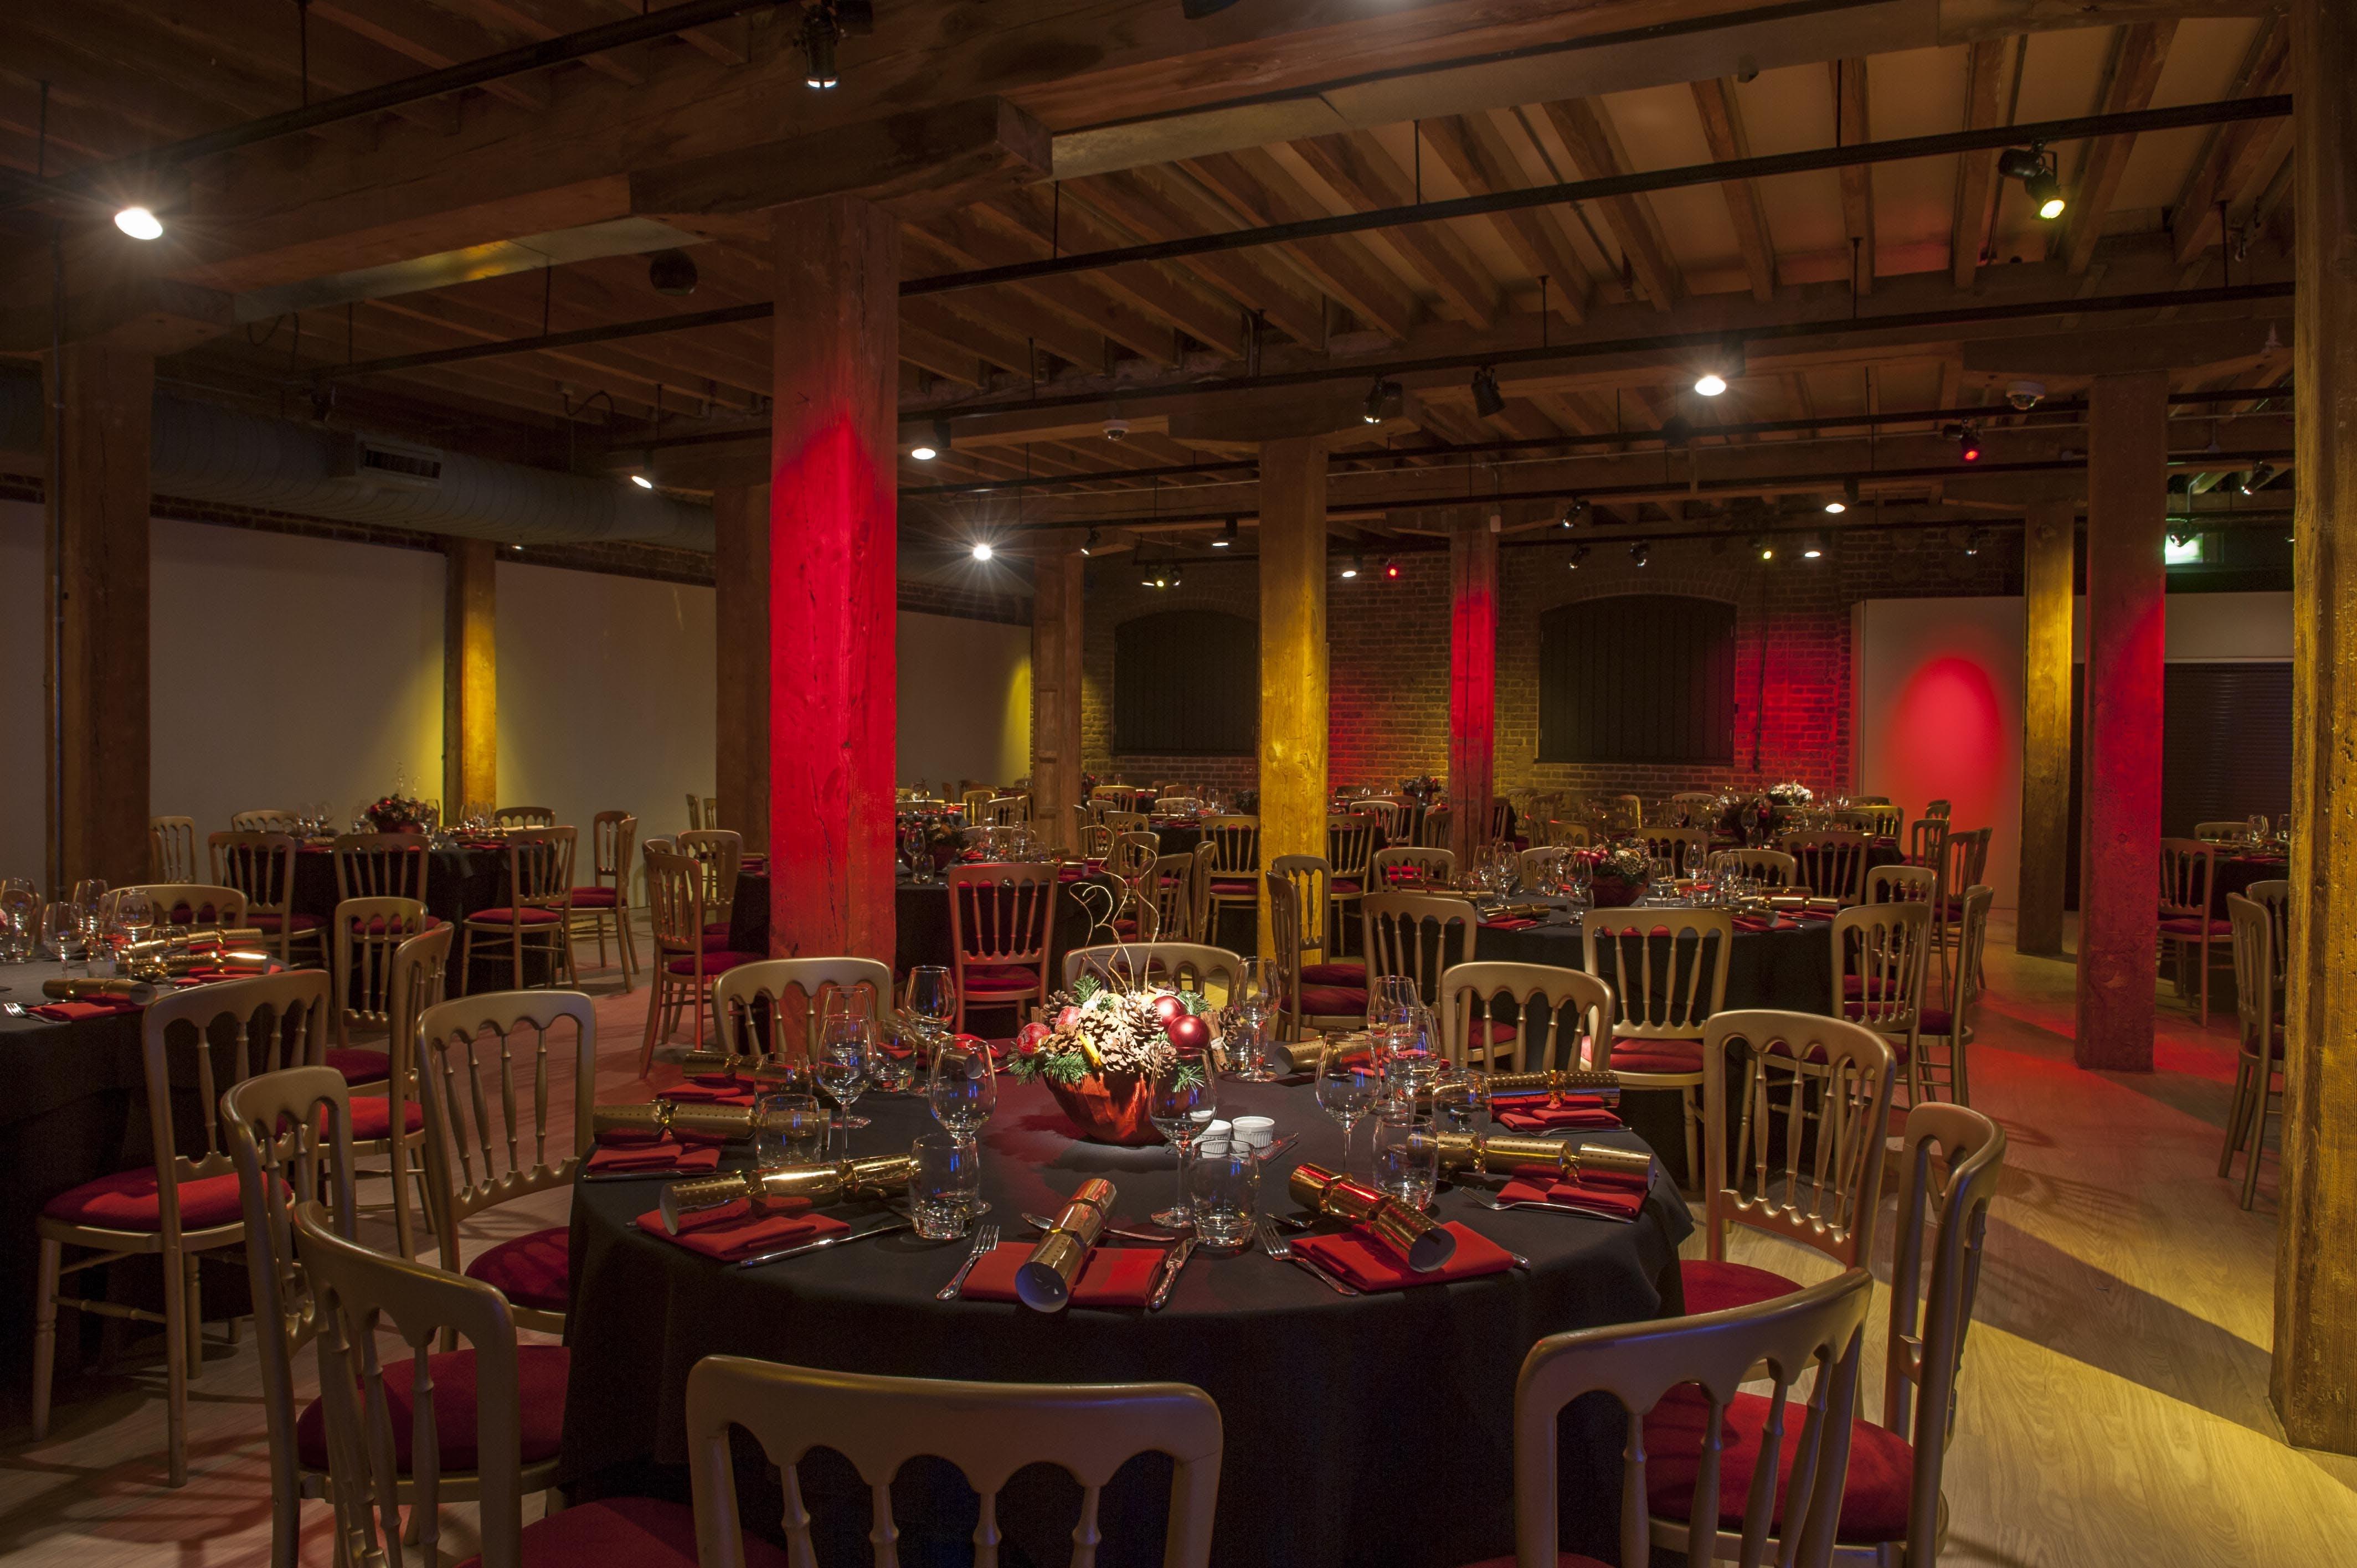 Wedding Reception Halls In London Budget Venues Images Decoration East